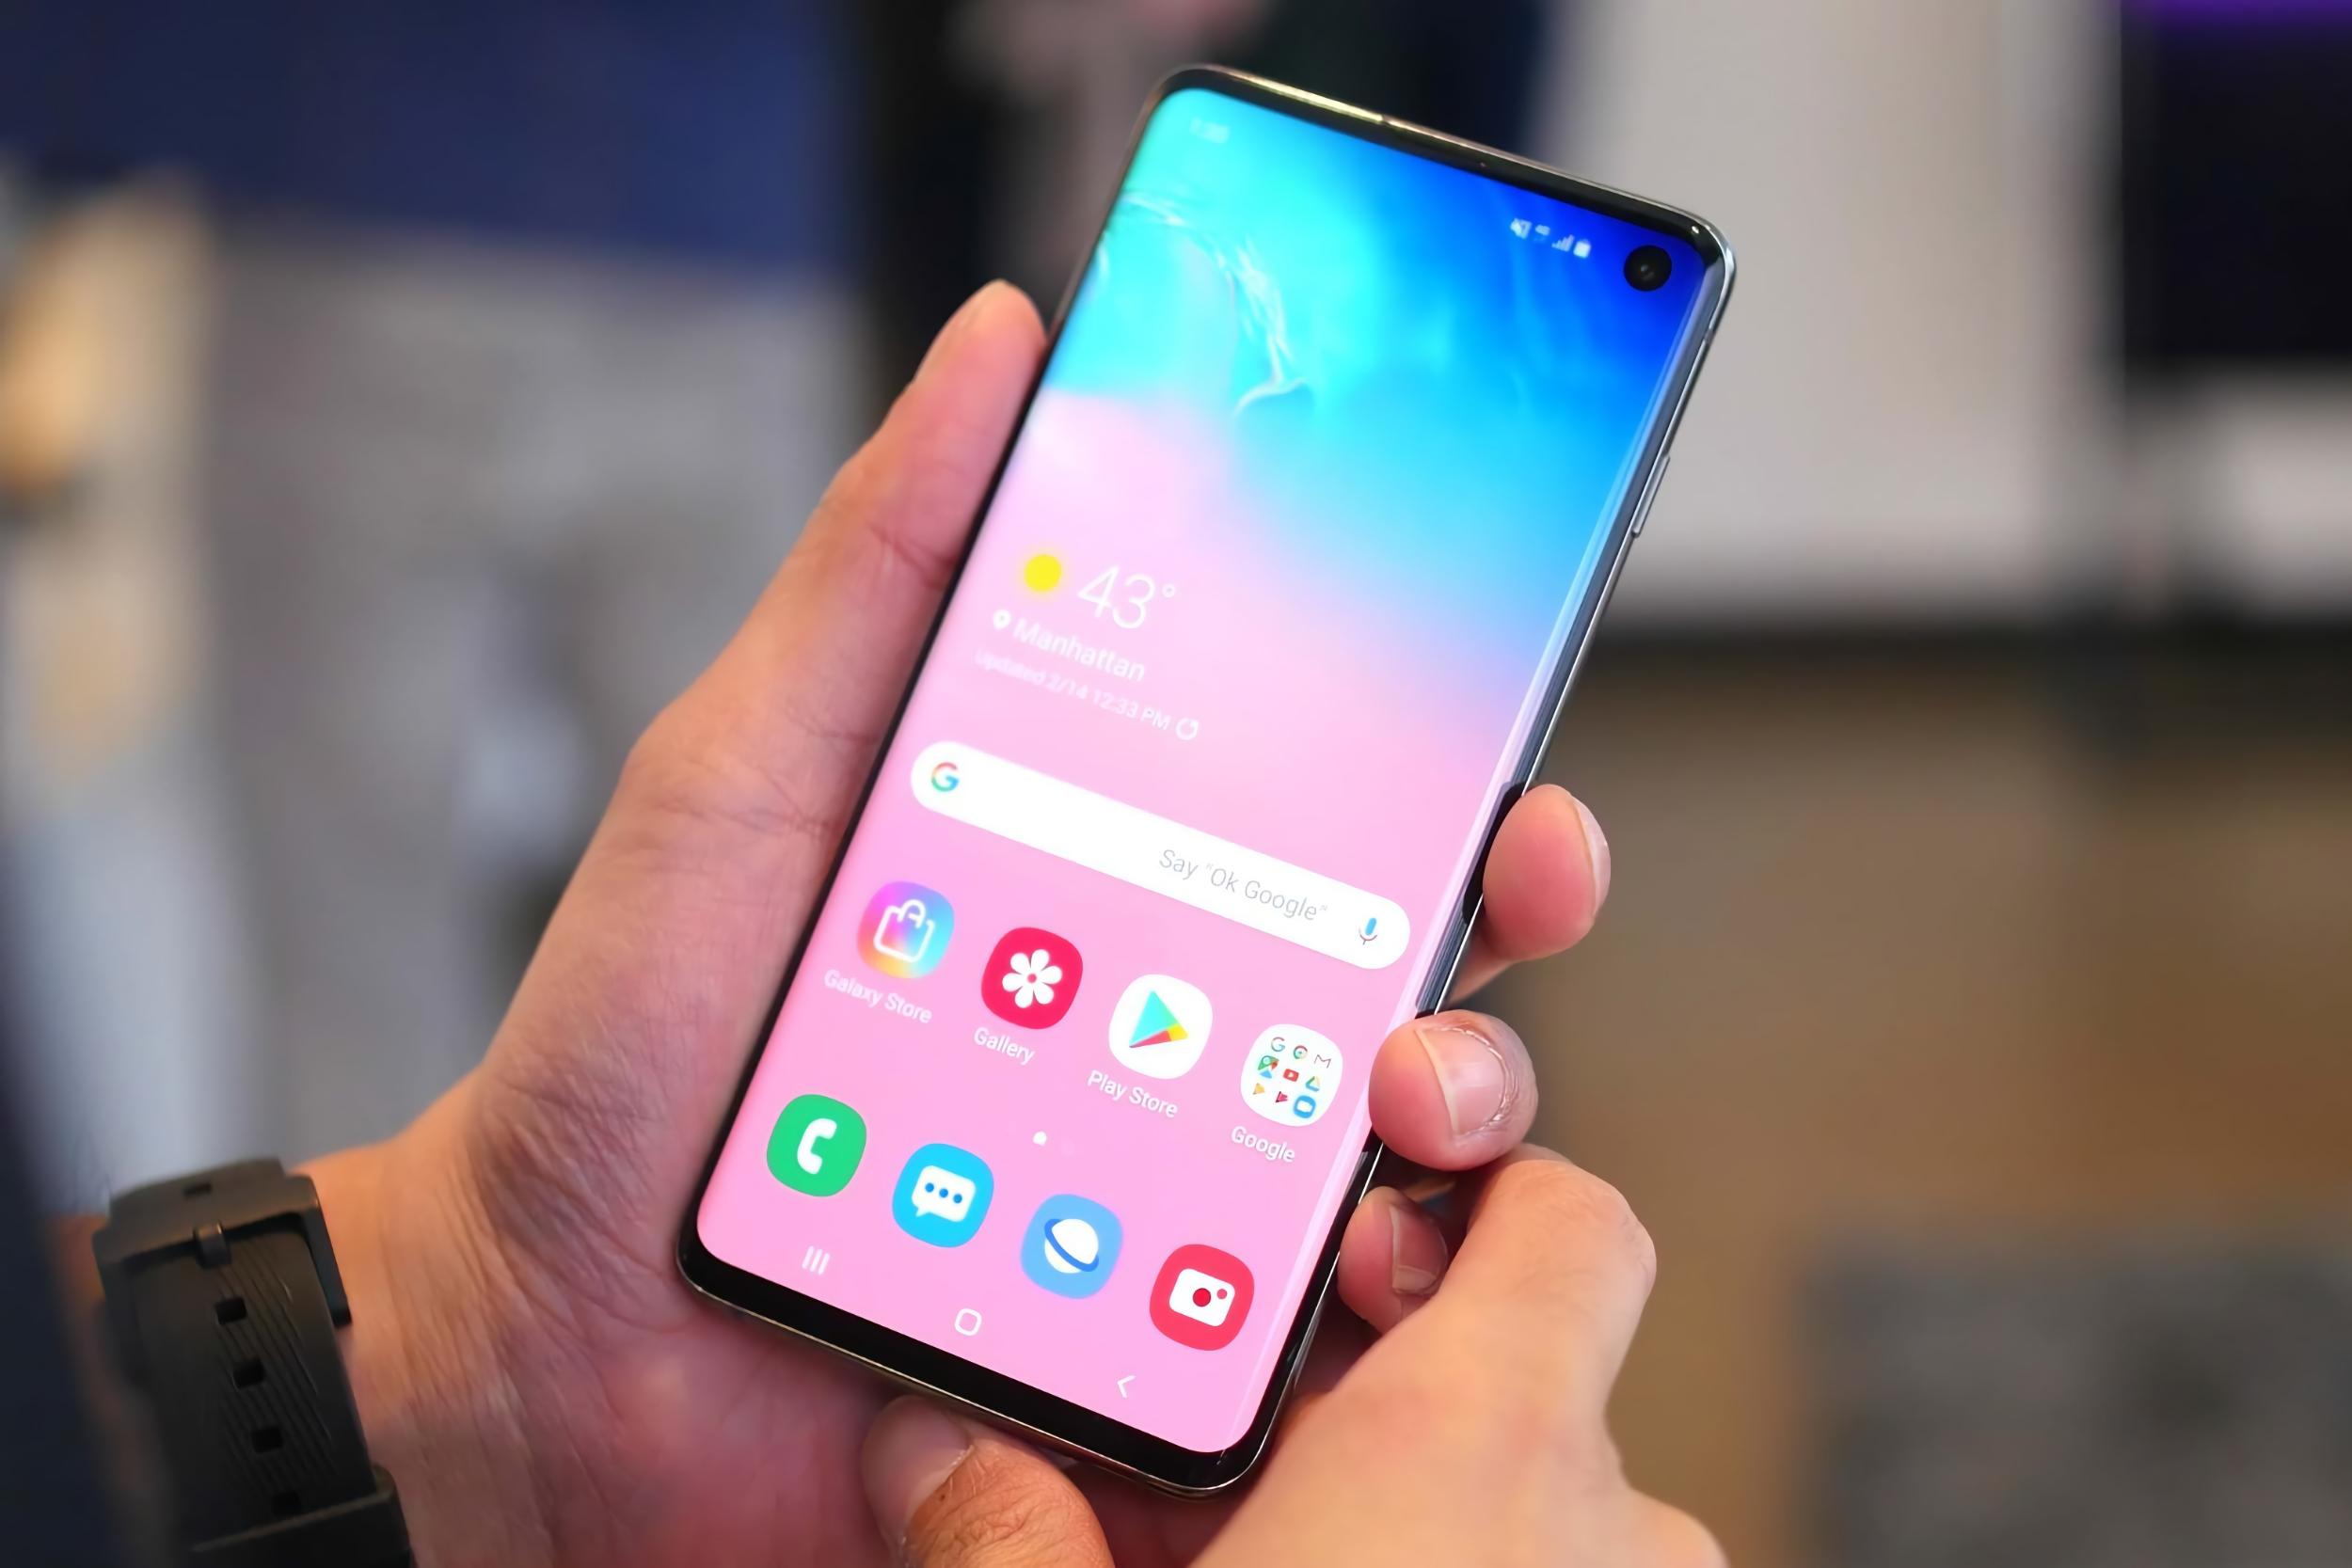 Samsung без объяснений возобновила обновление Android 11 с One UI 3.0 для смартфонов Galaxy S10